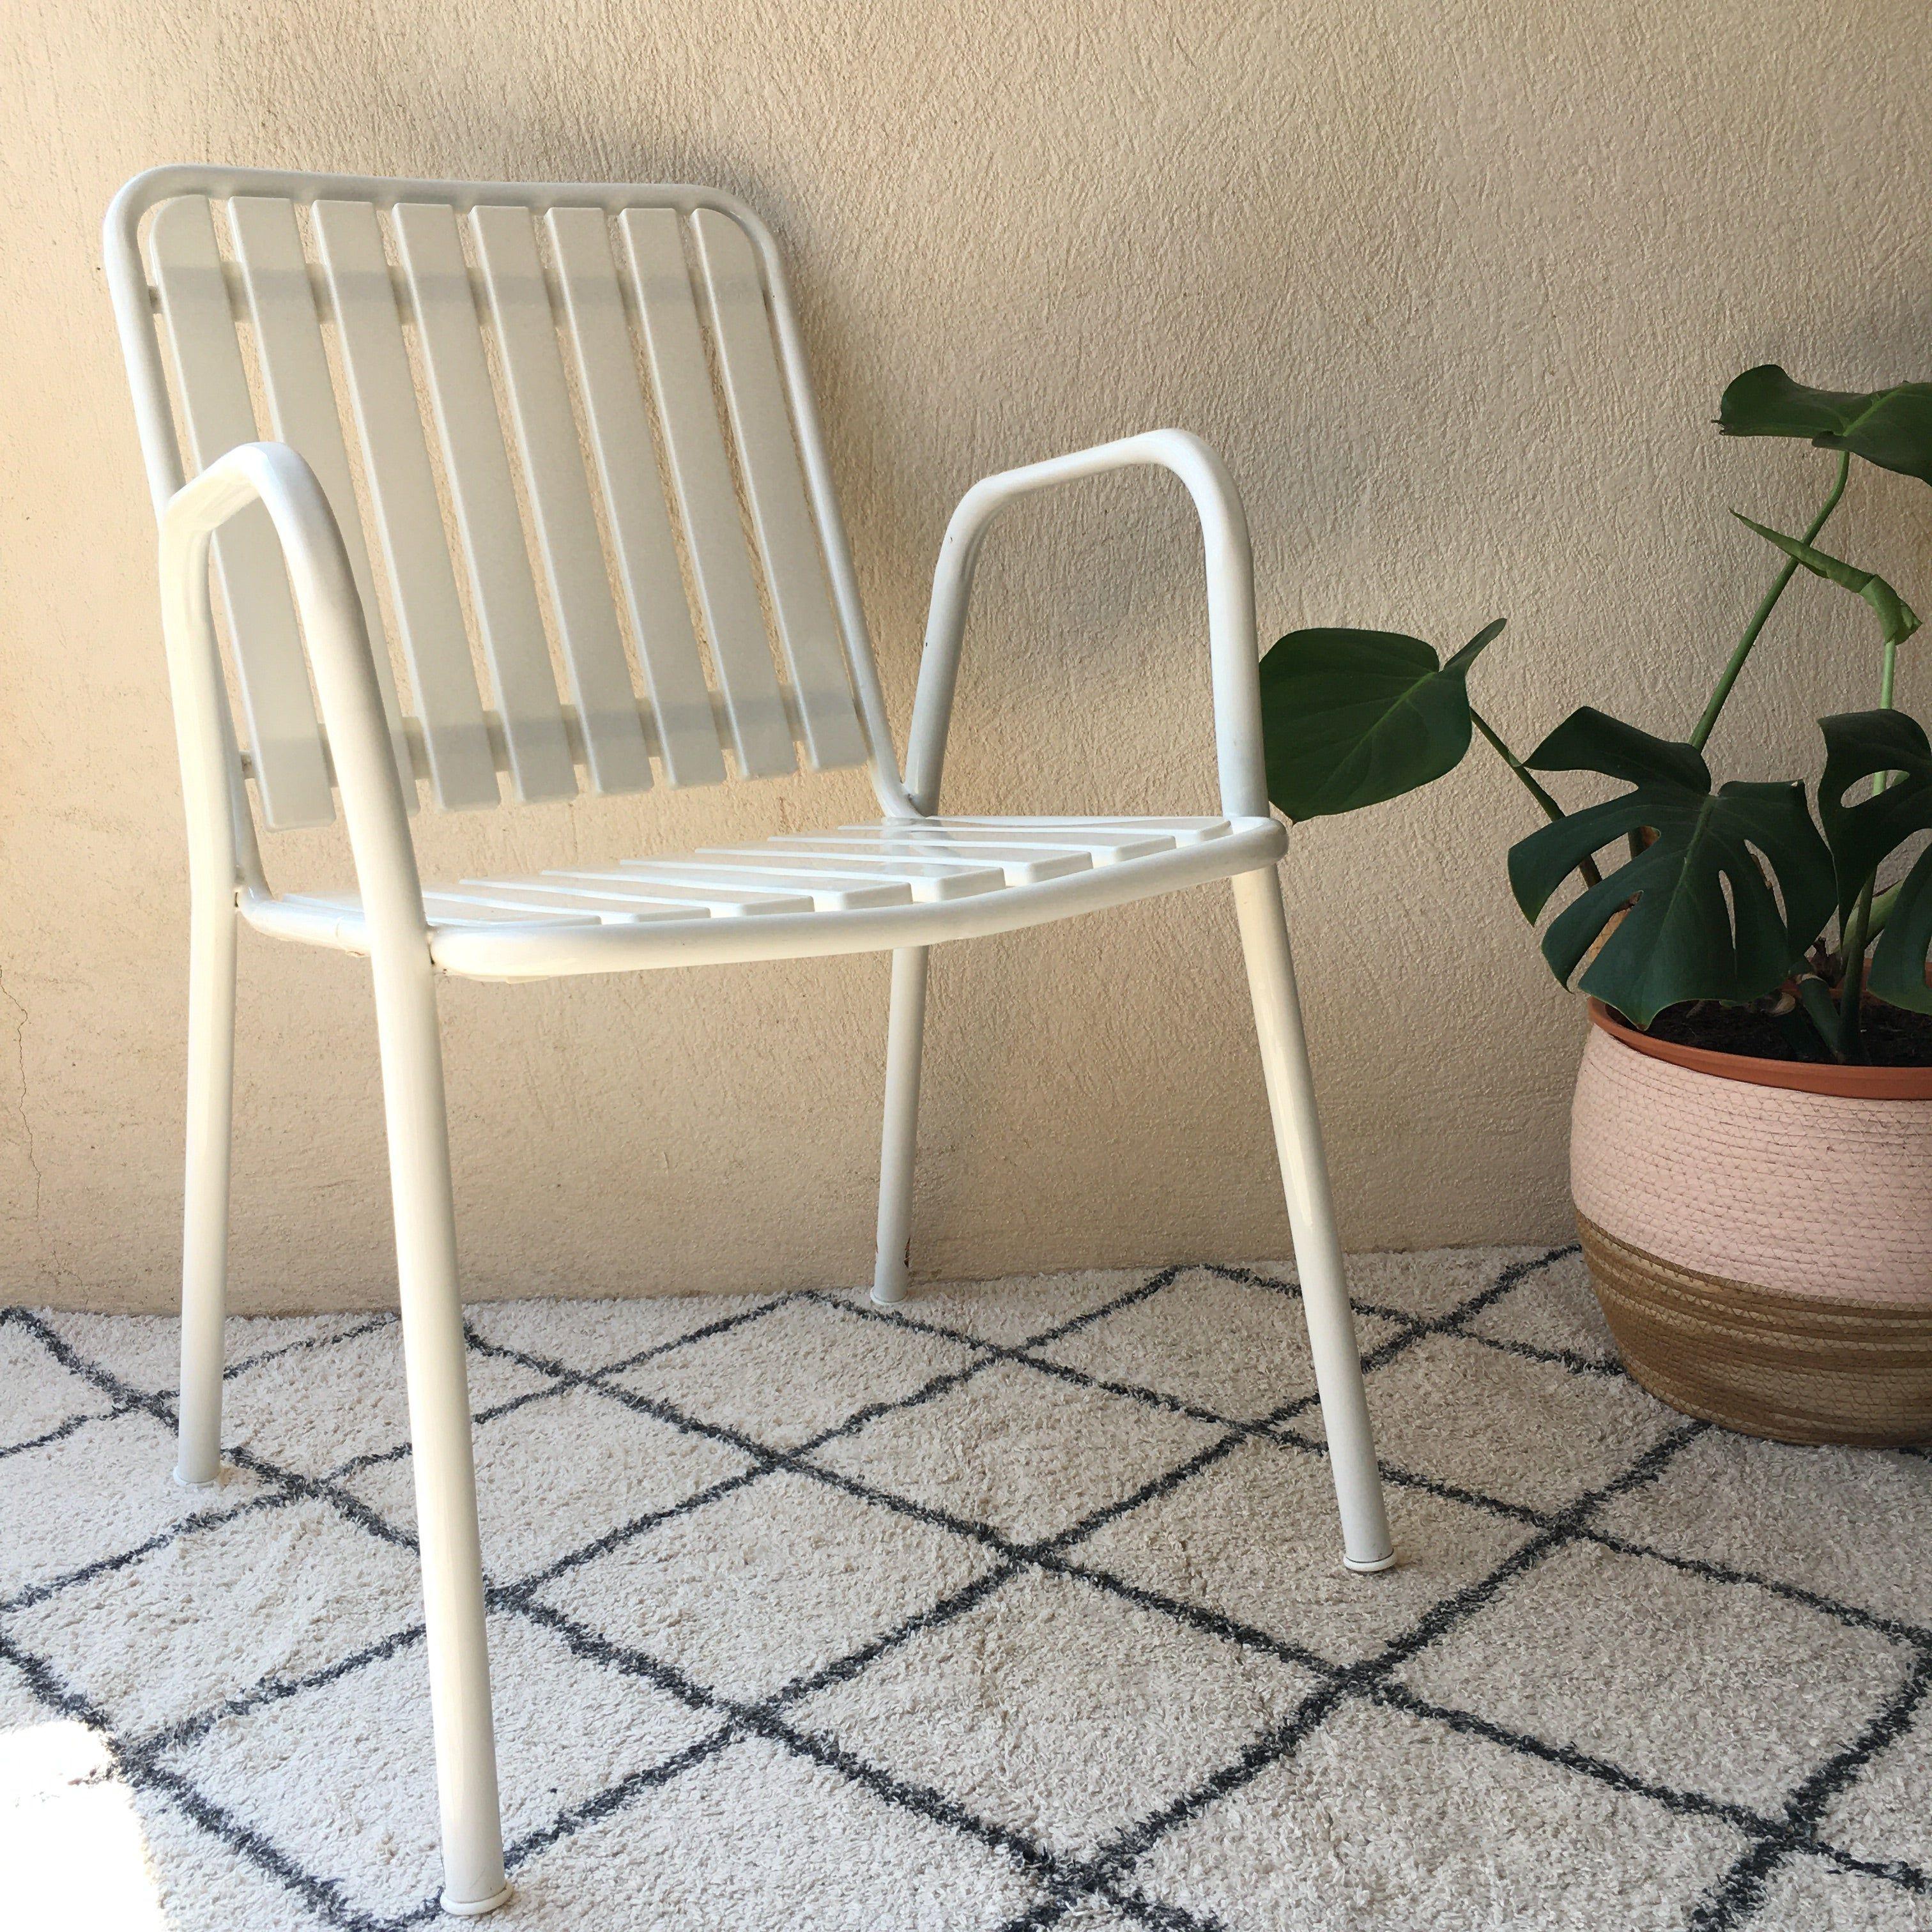 Orangevertevintage Chaise De Jardin Vintage En 2020 Chaise De Jardin Jardin Vintage Mobilier